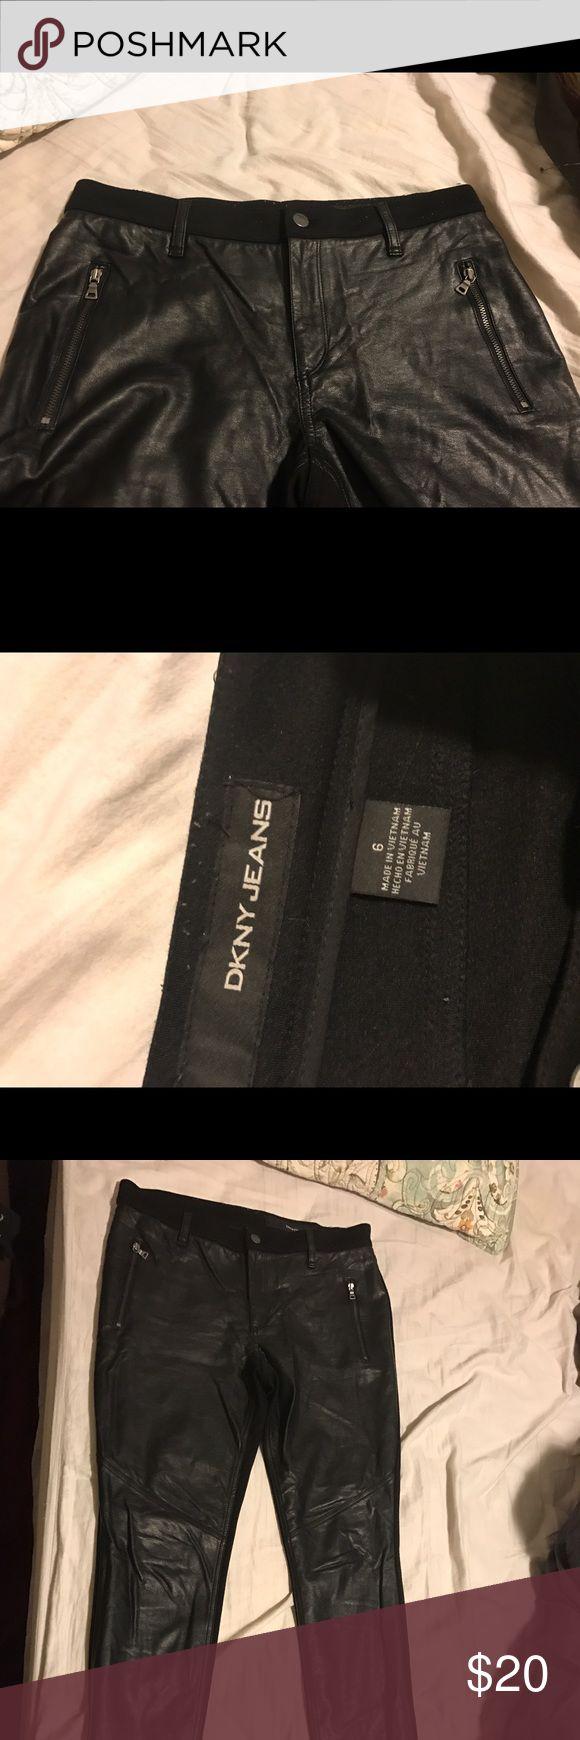 Dkny faux leather skinny pants Dkny brand, faux leather front. Faux leather belt loops. DKNY Pants Skinny